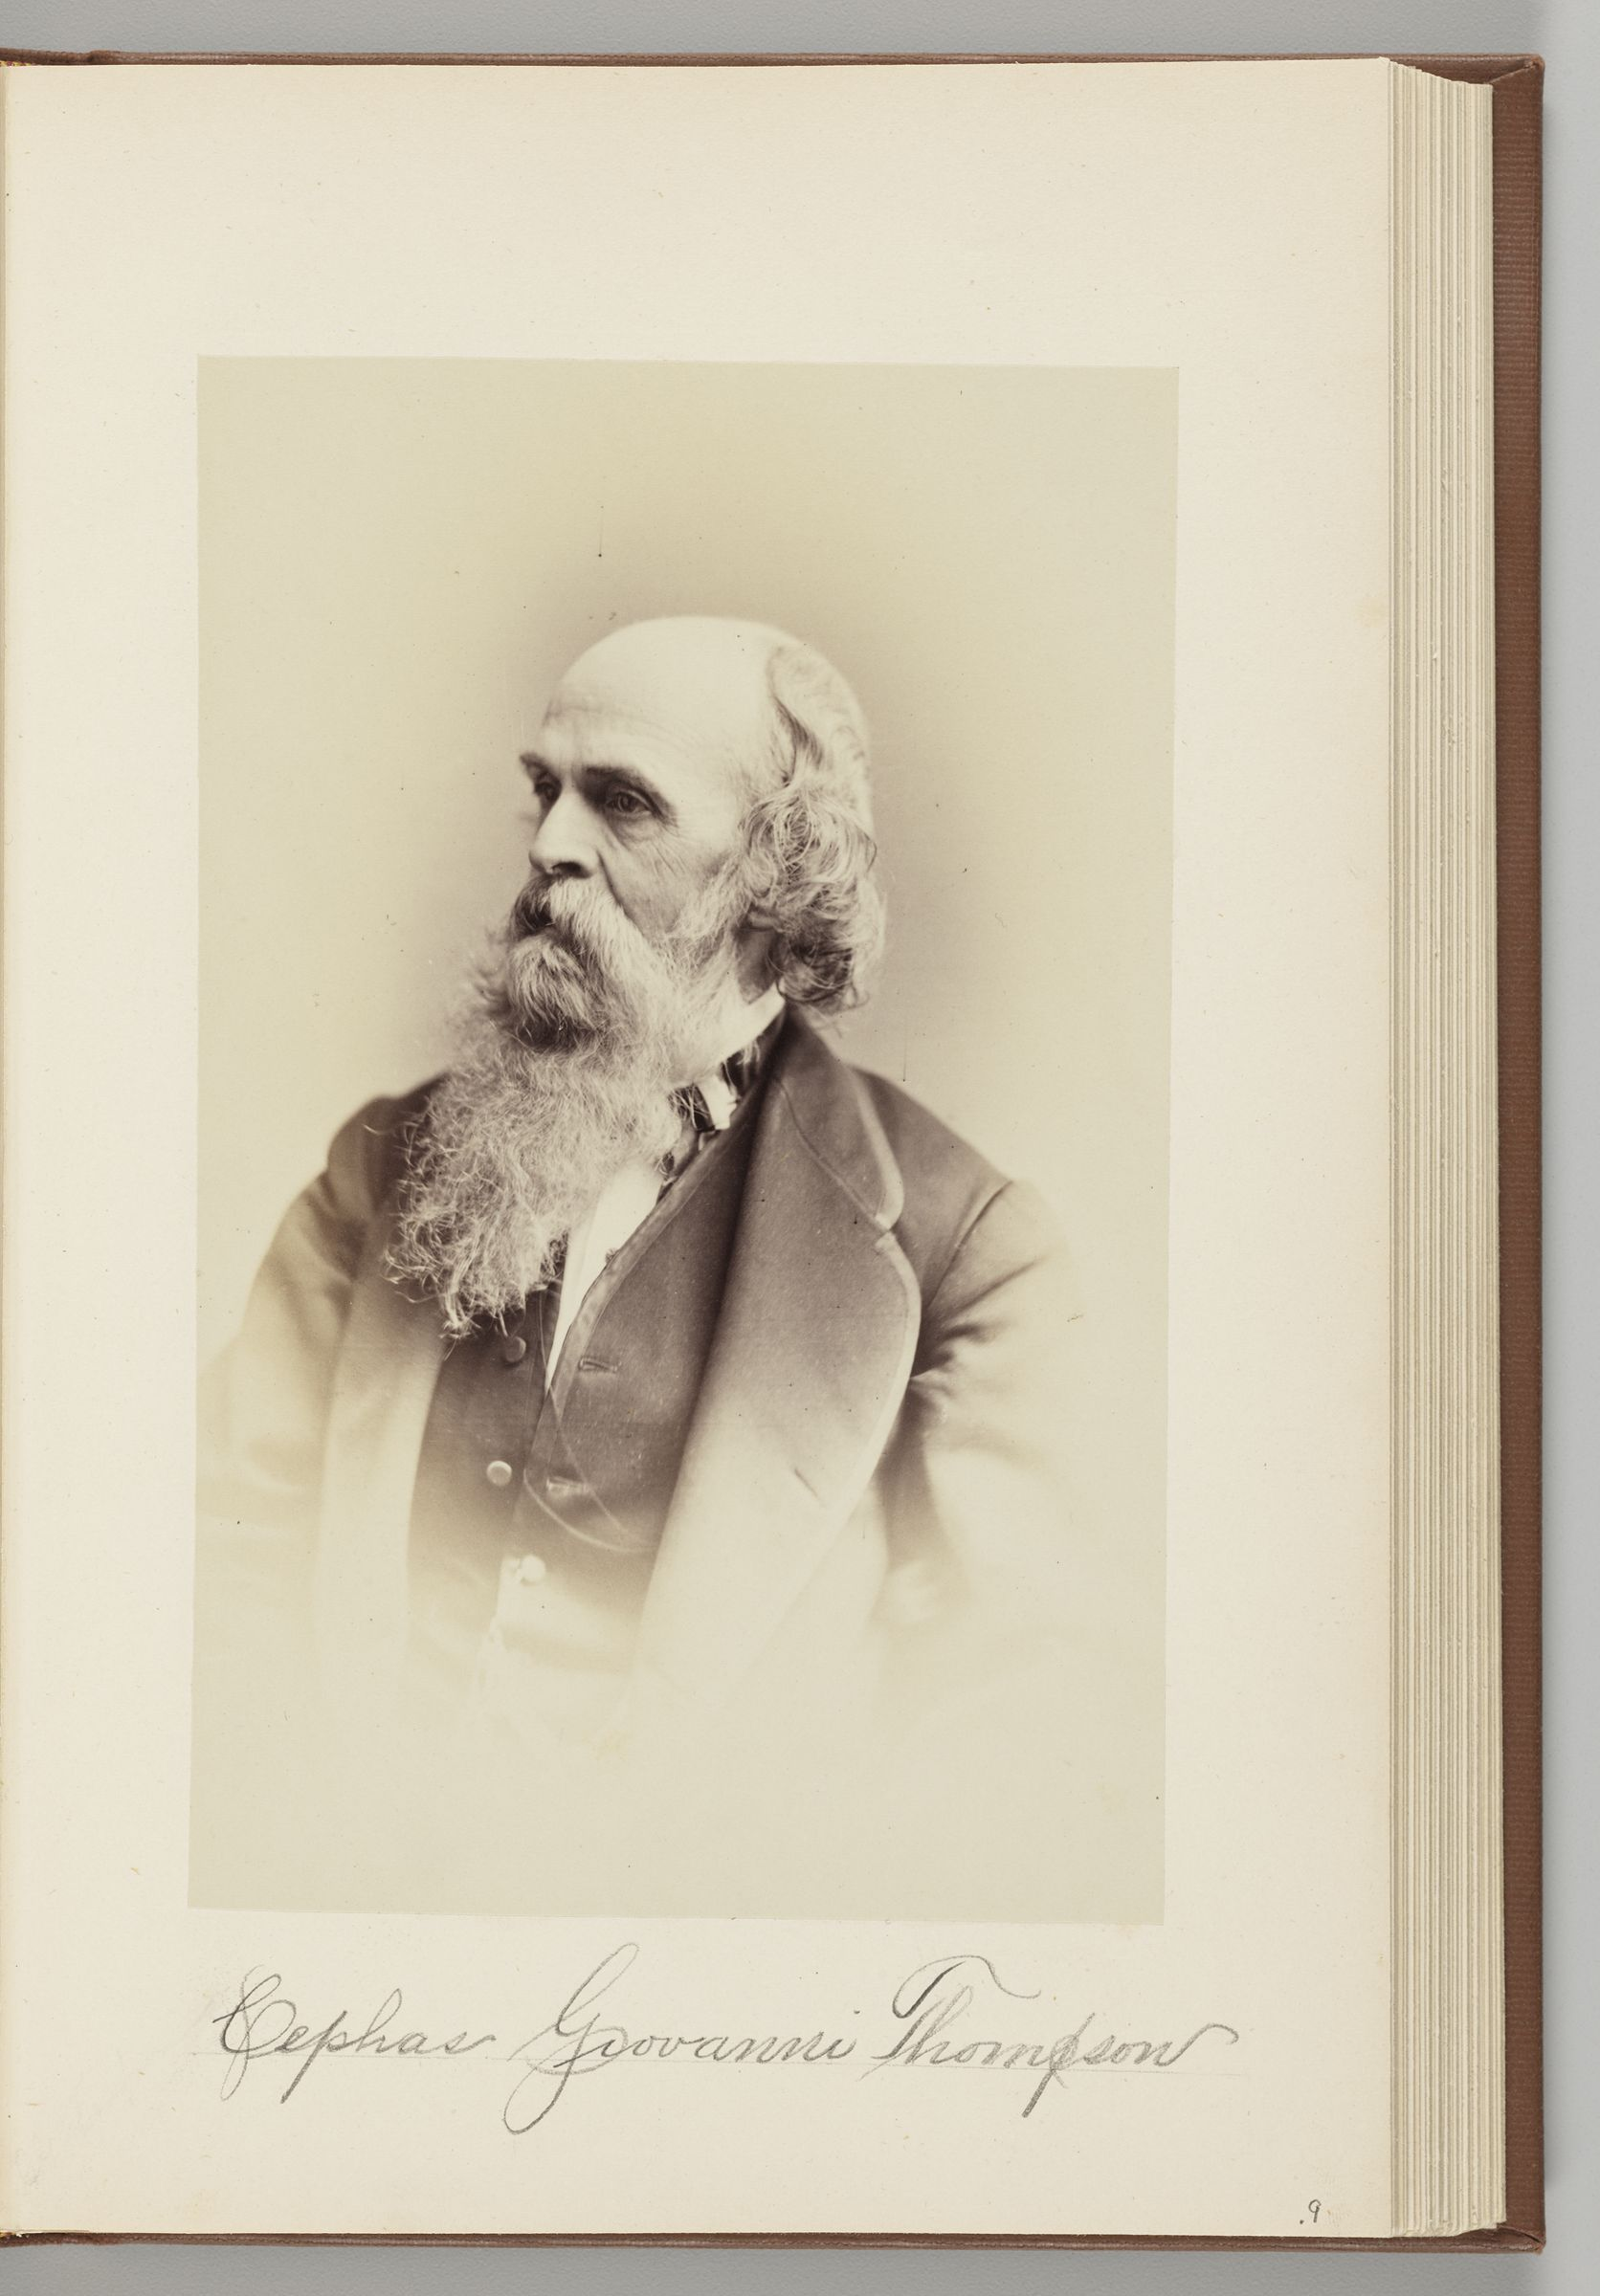 Cephas Giovanni Thompson (1809-1888)